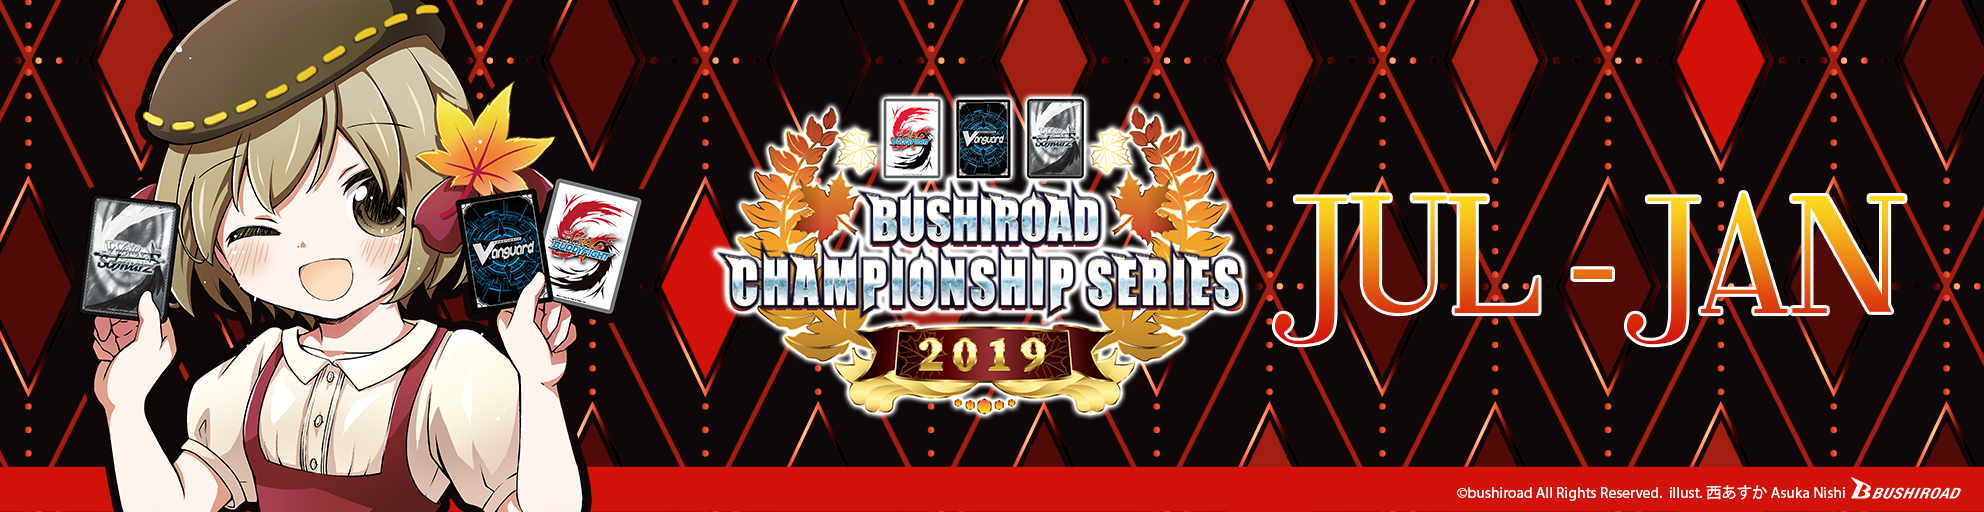 Bushiroad Championship Series 2019 BCS2019